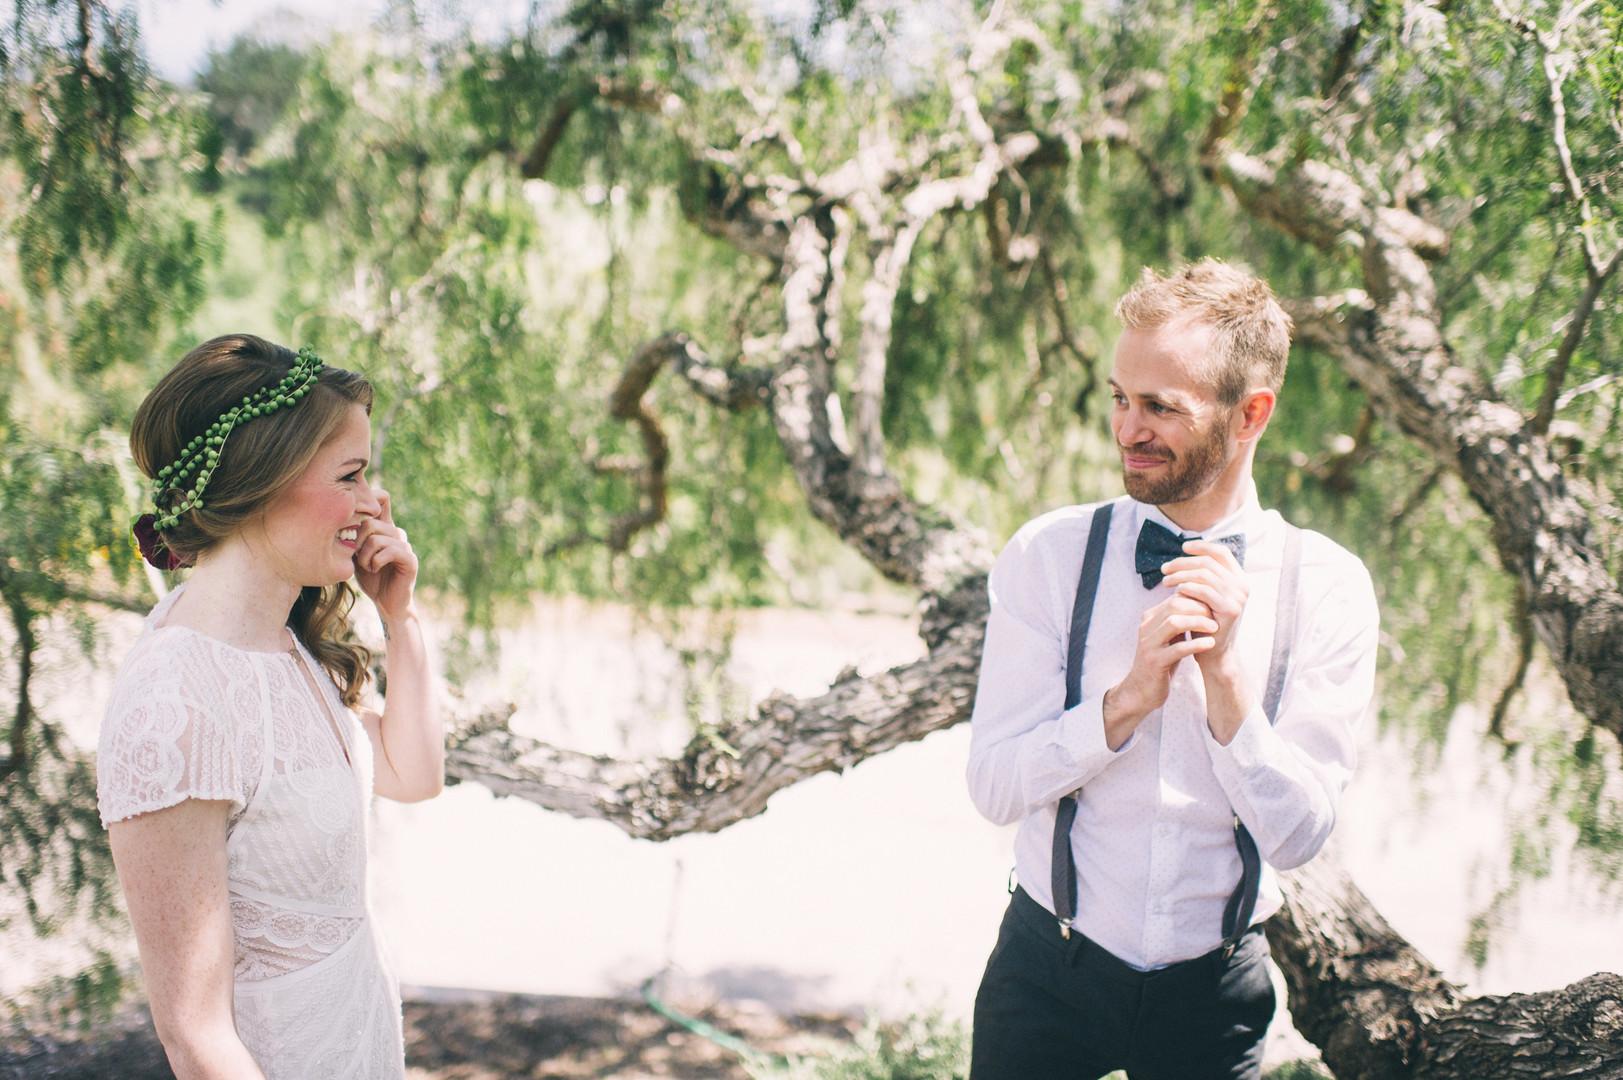 www.santabarbarawedding.com | Sarah Katherine Davis Photography | Santa Barbara Museum of Natural History | Wild Heart Events | BHLDN | Pretty Please Beauty | Bride and Groom First Look